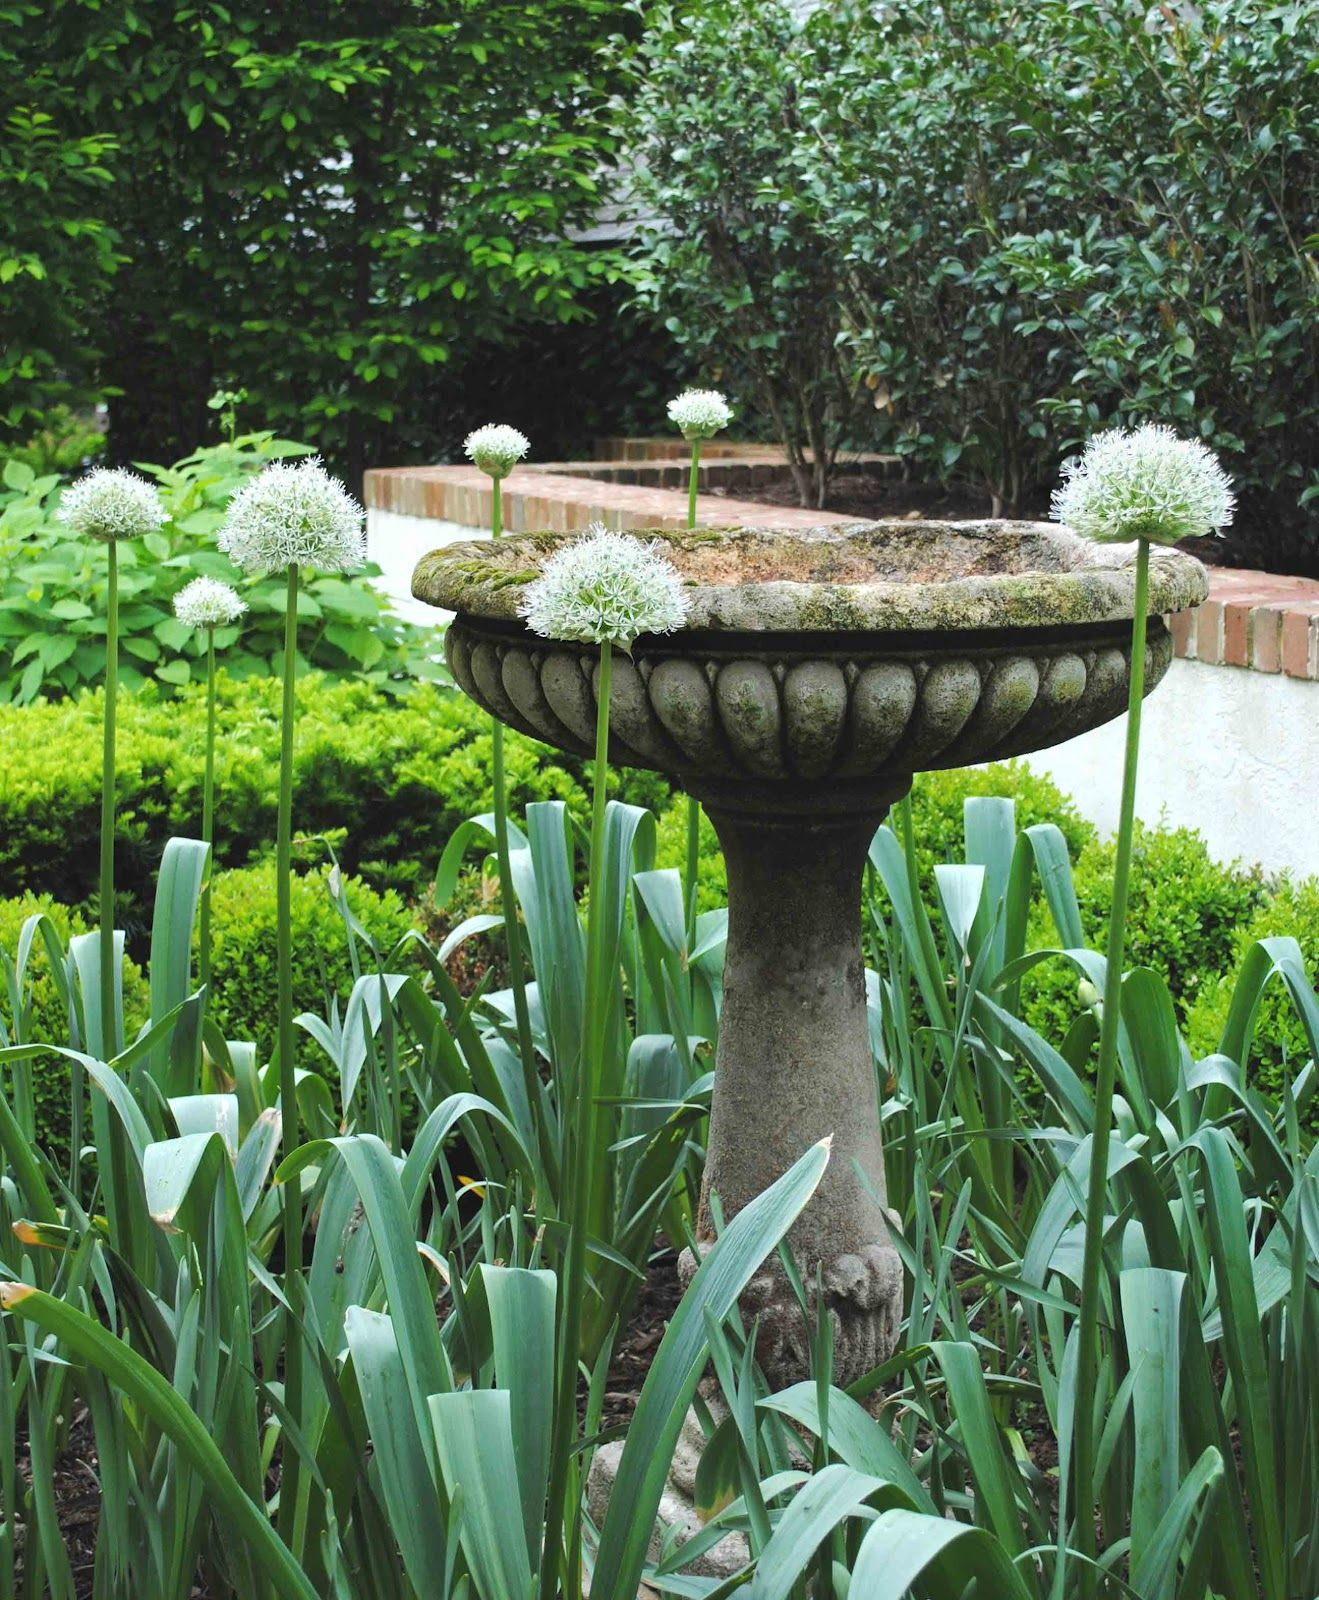 Alliums Surrounding The Birdbath In The Garden ~ Loi Thai